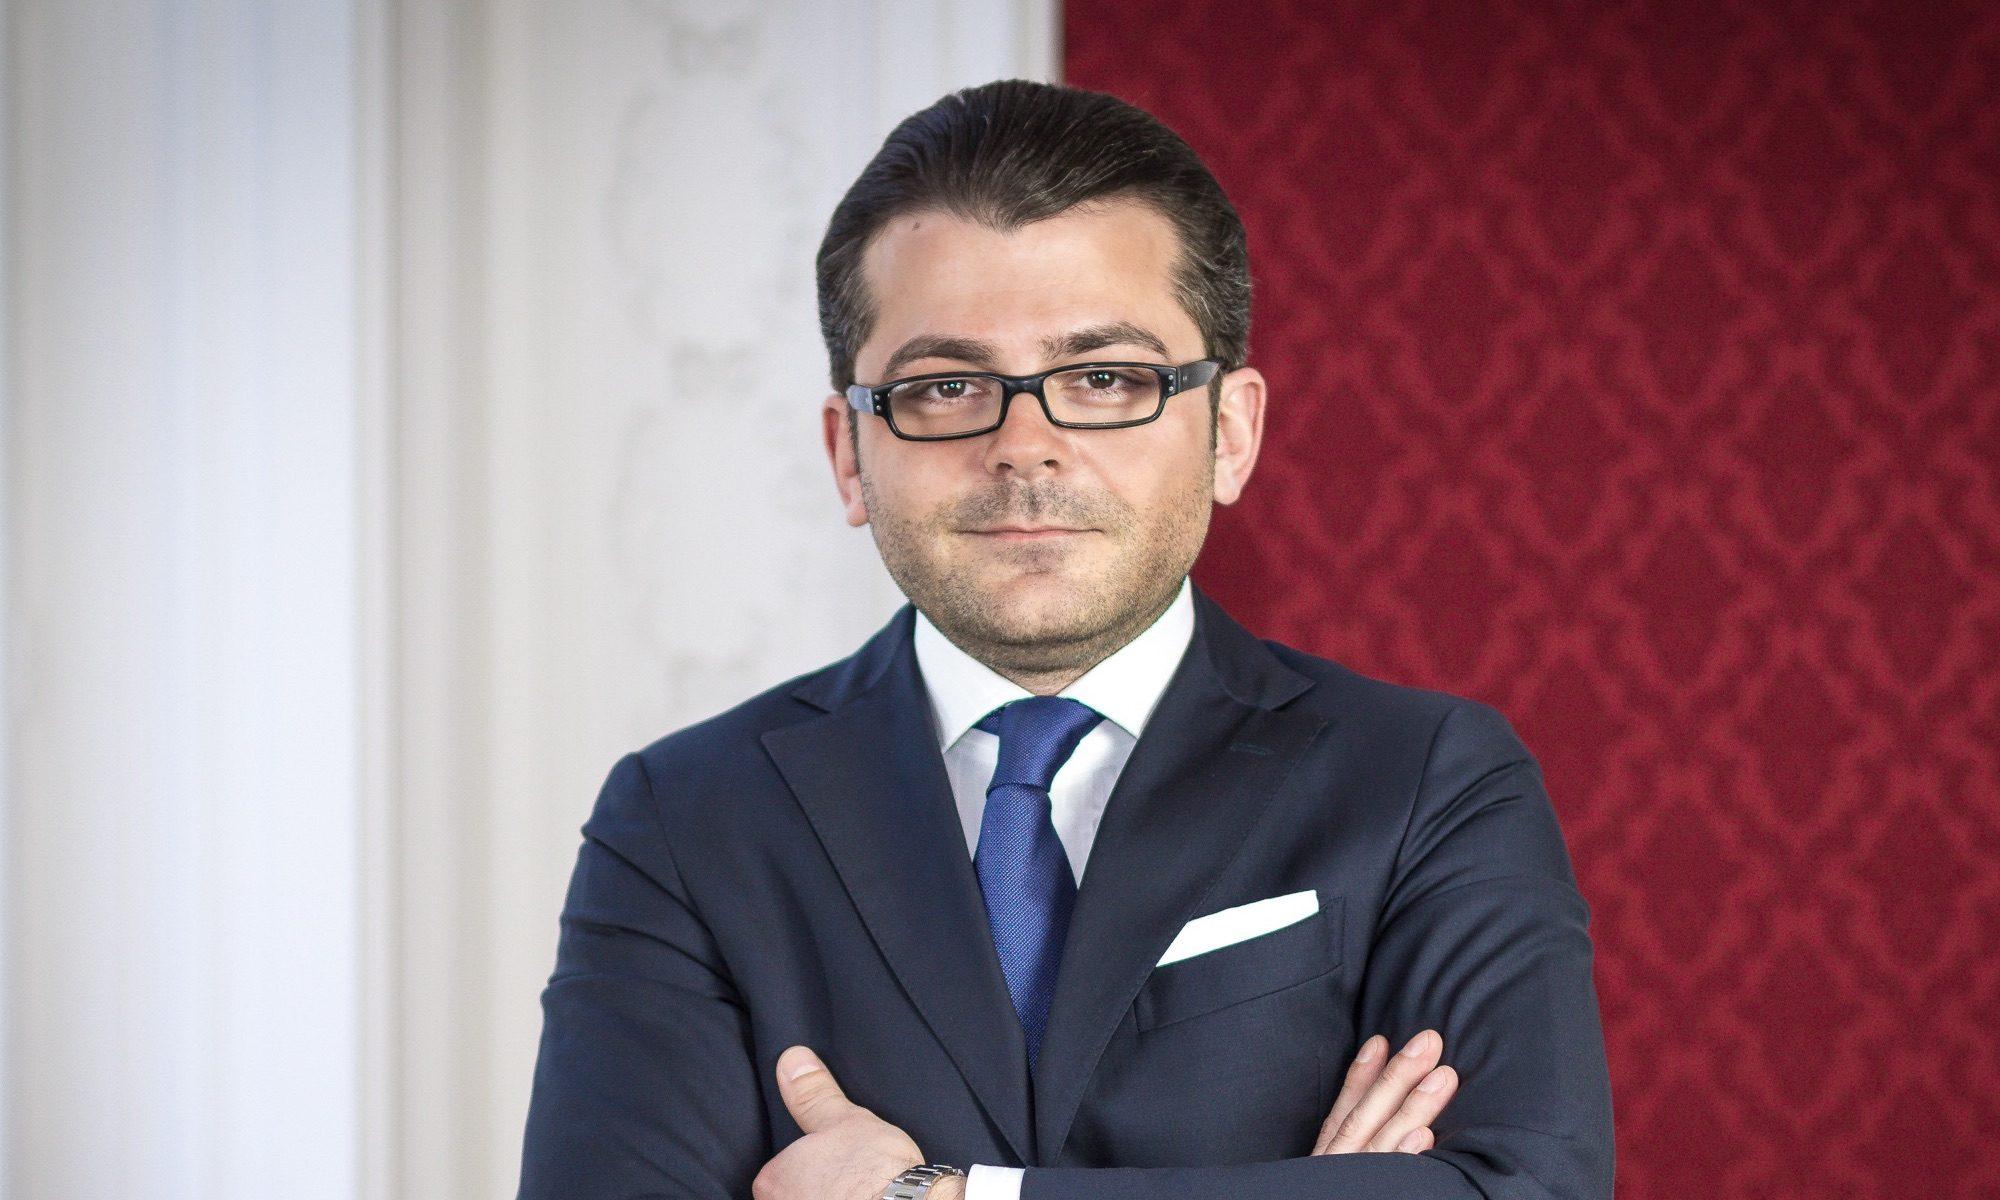 Kanzlei Mag. Michael Leibel